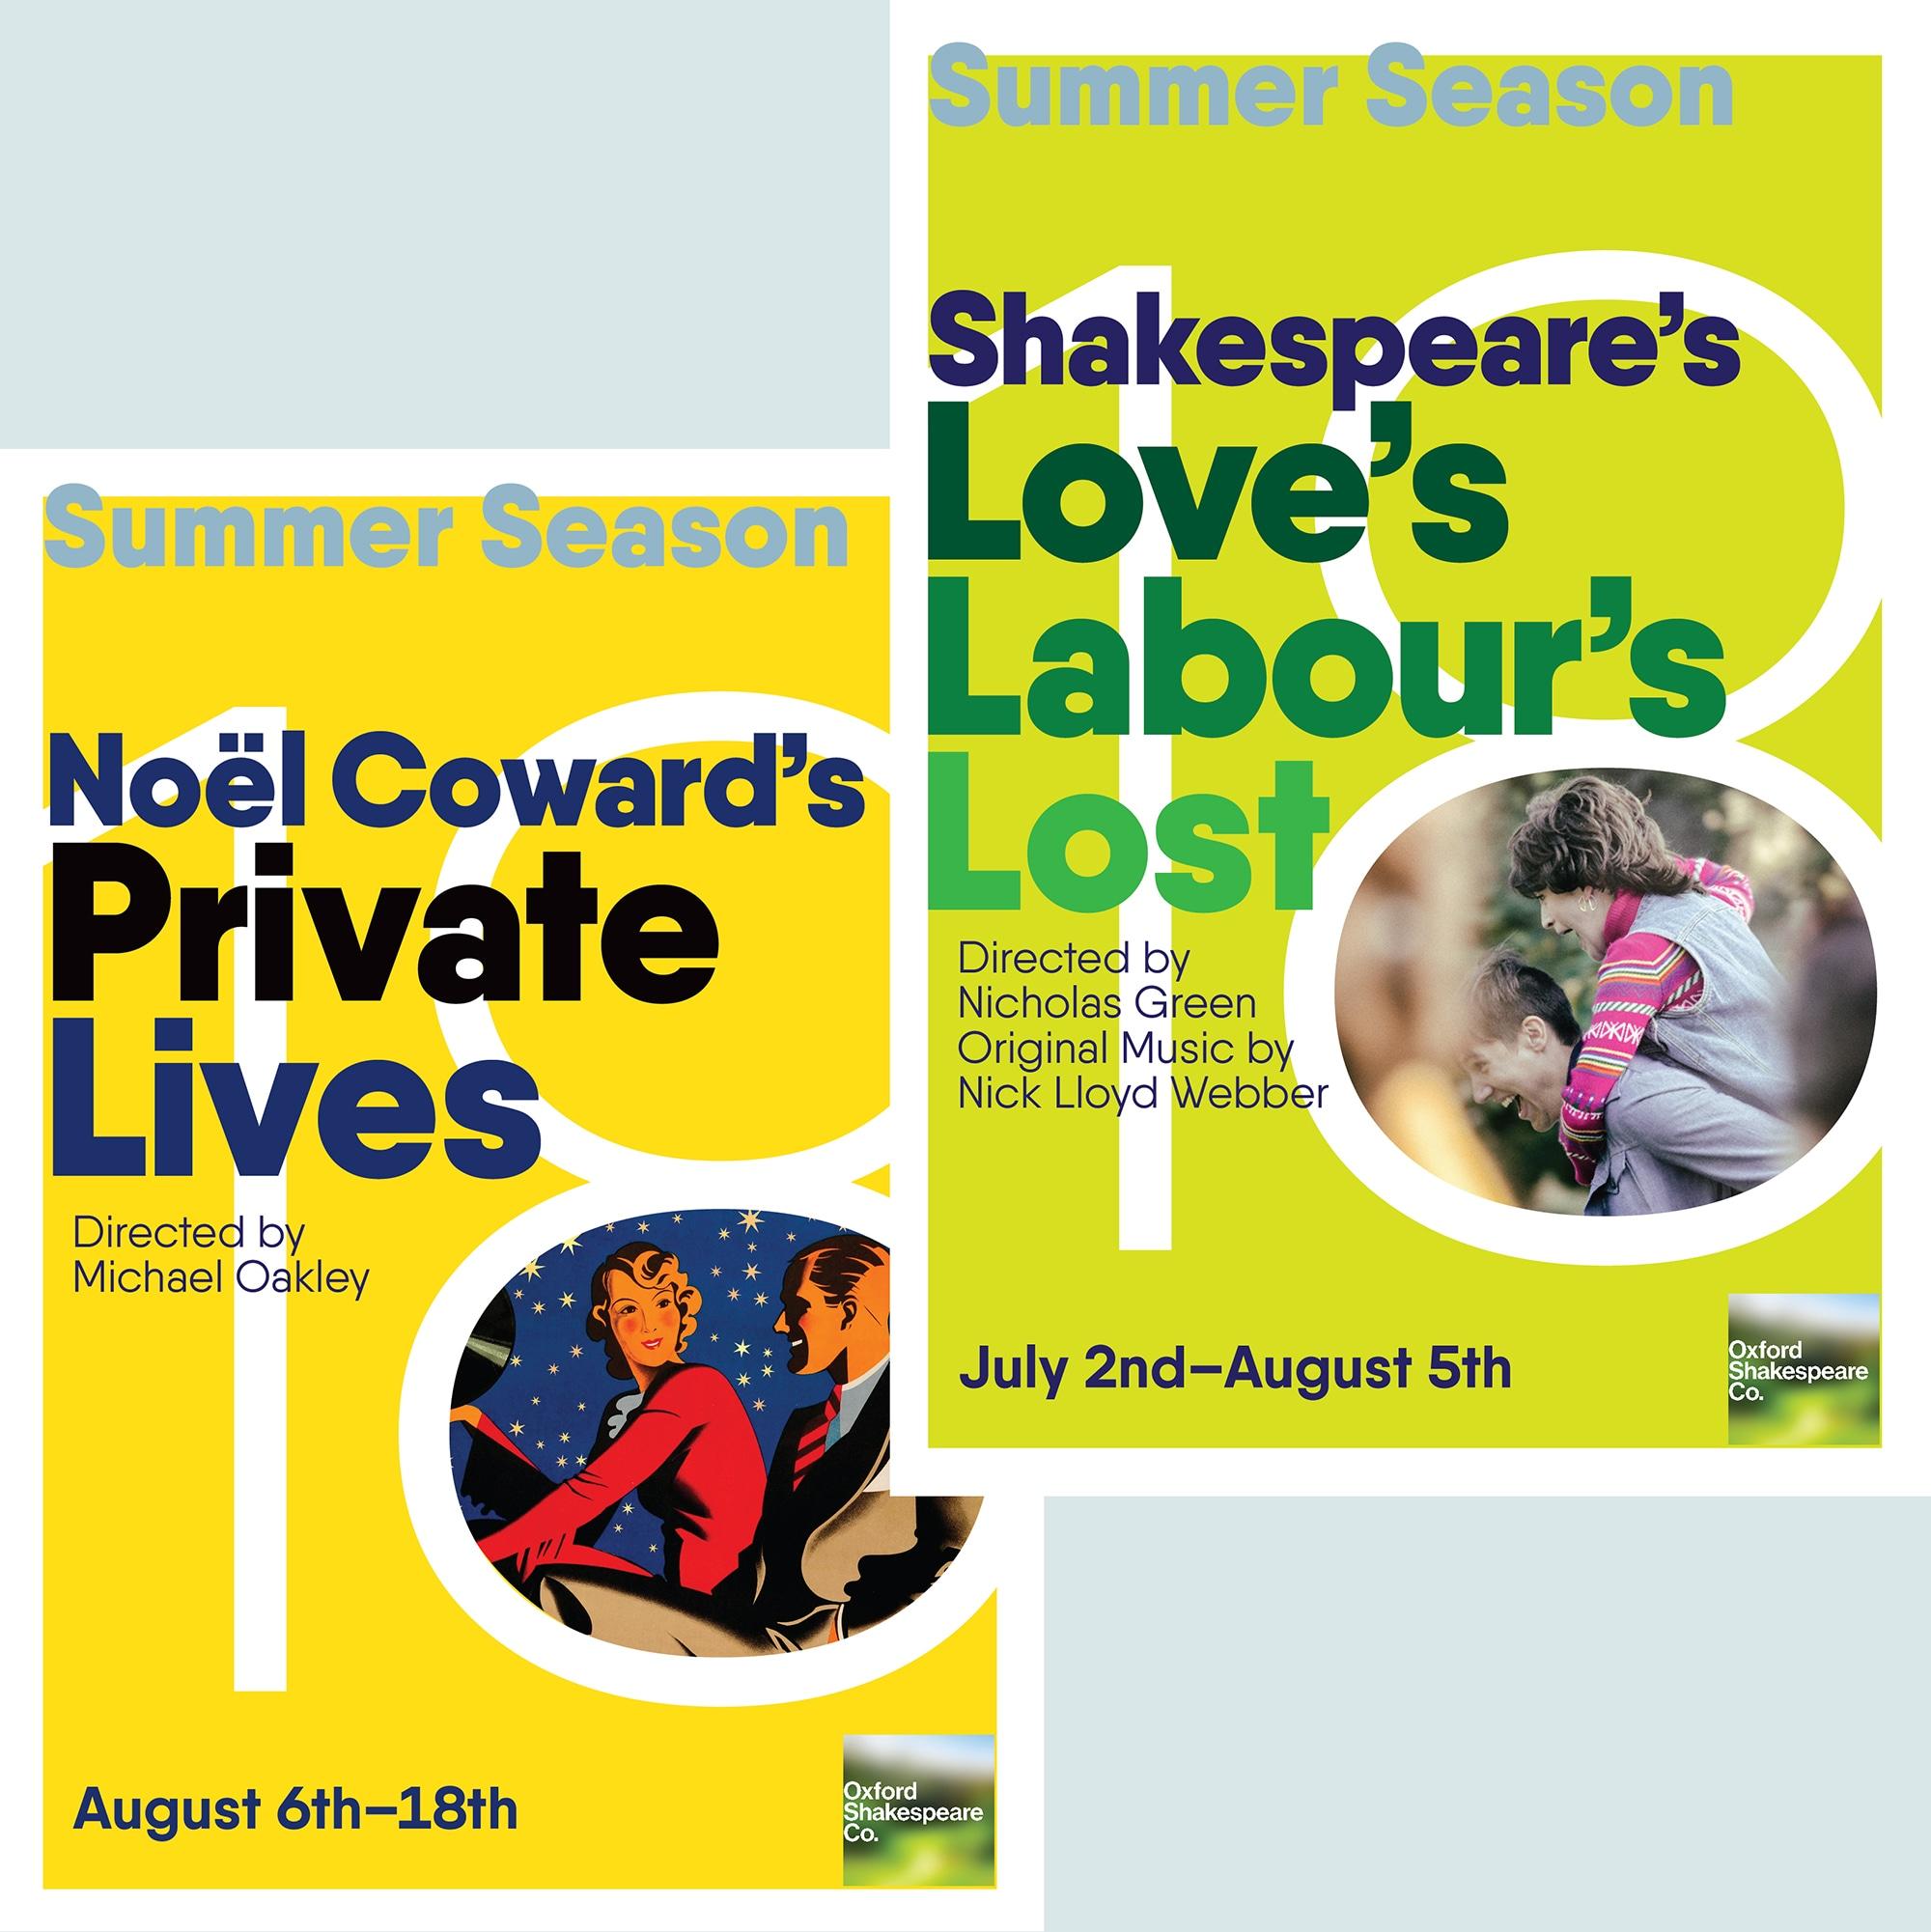 Oxford Shakespeare Co. - Rebrand, logo, website, logo